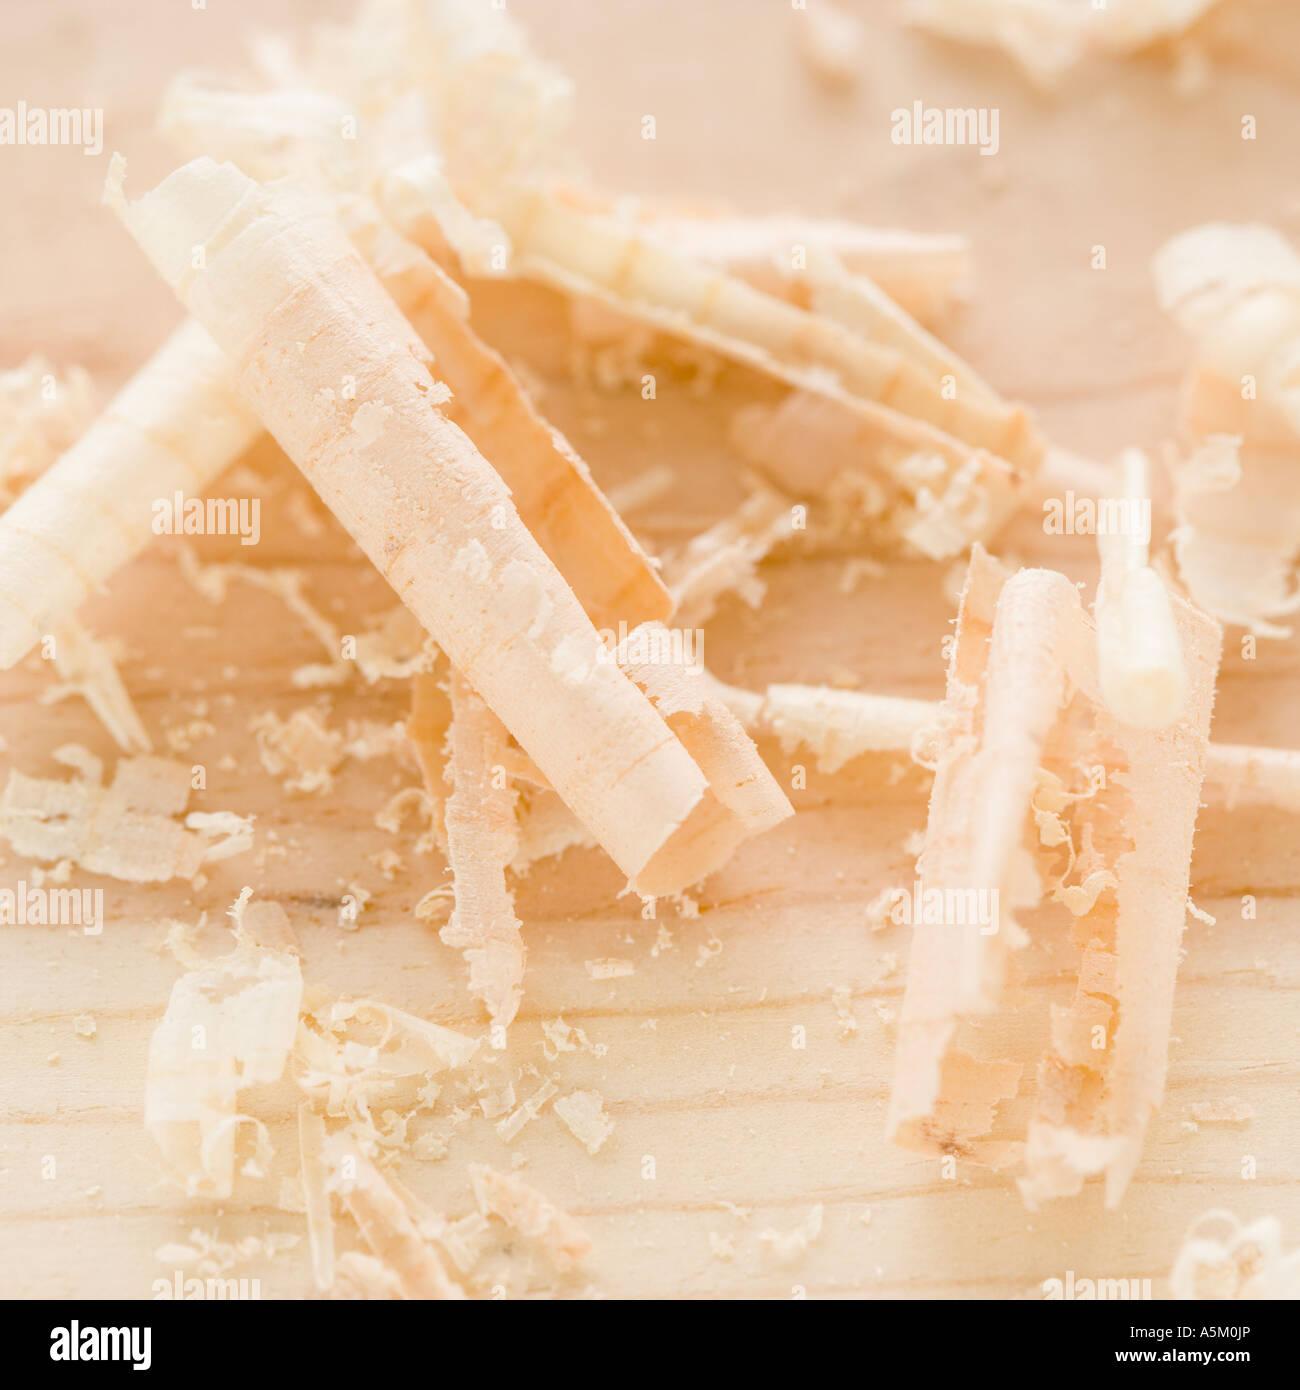 Close up of wood shavings Stock Photo